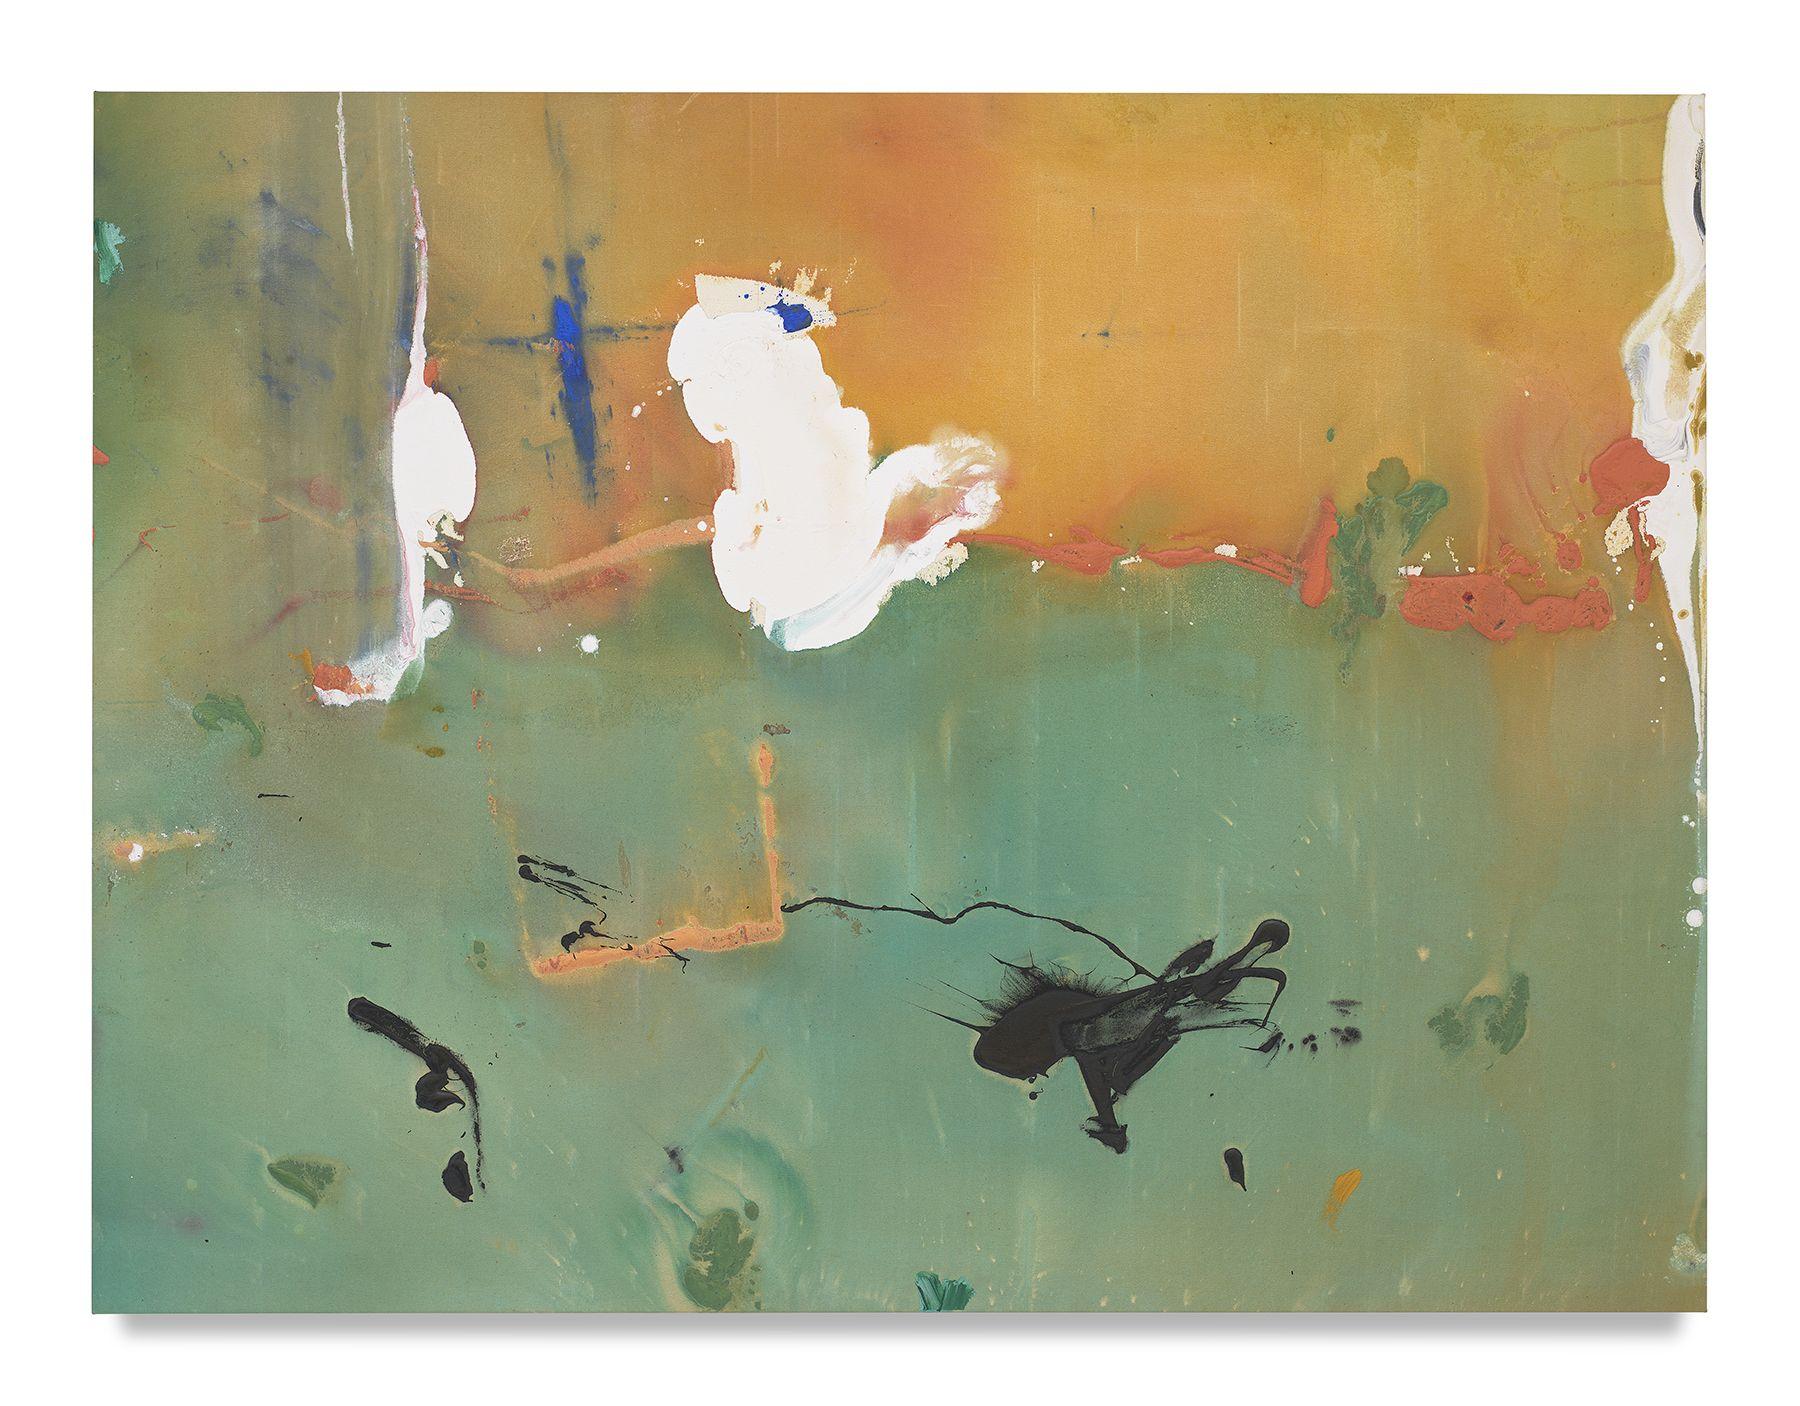 Helen Frankenthaler, White Joy, 1981, Acrylic on canvas, 53 x 70 inches, 134.6 x 177.8 cm, MMG#14149,